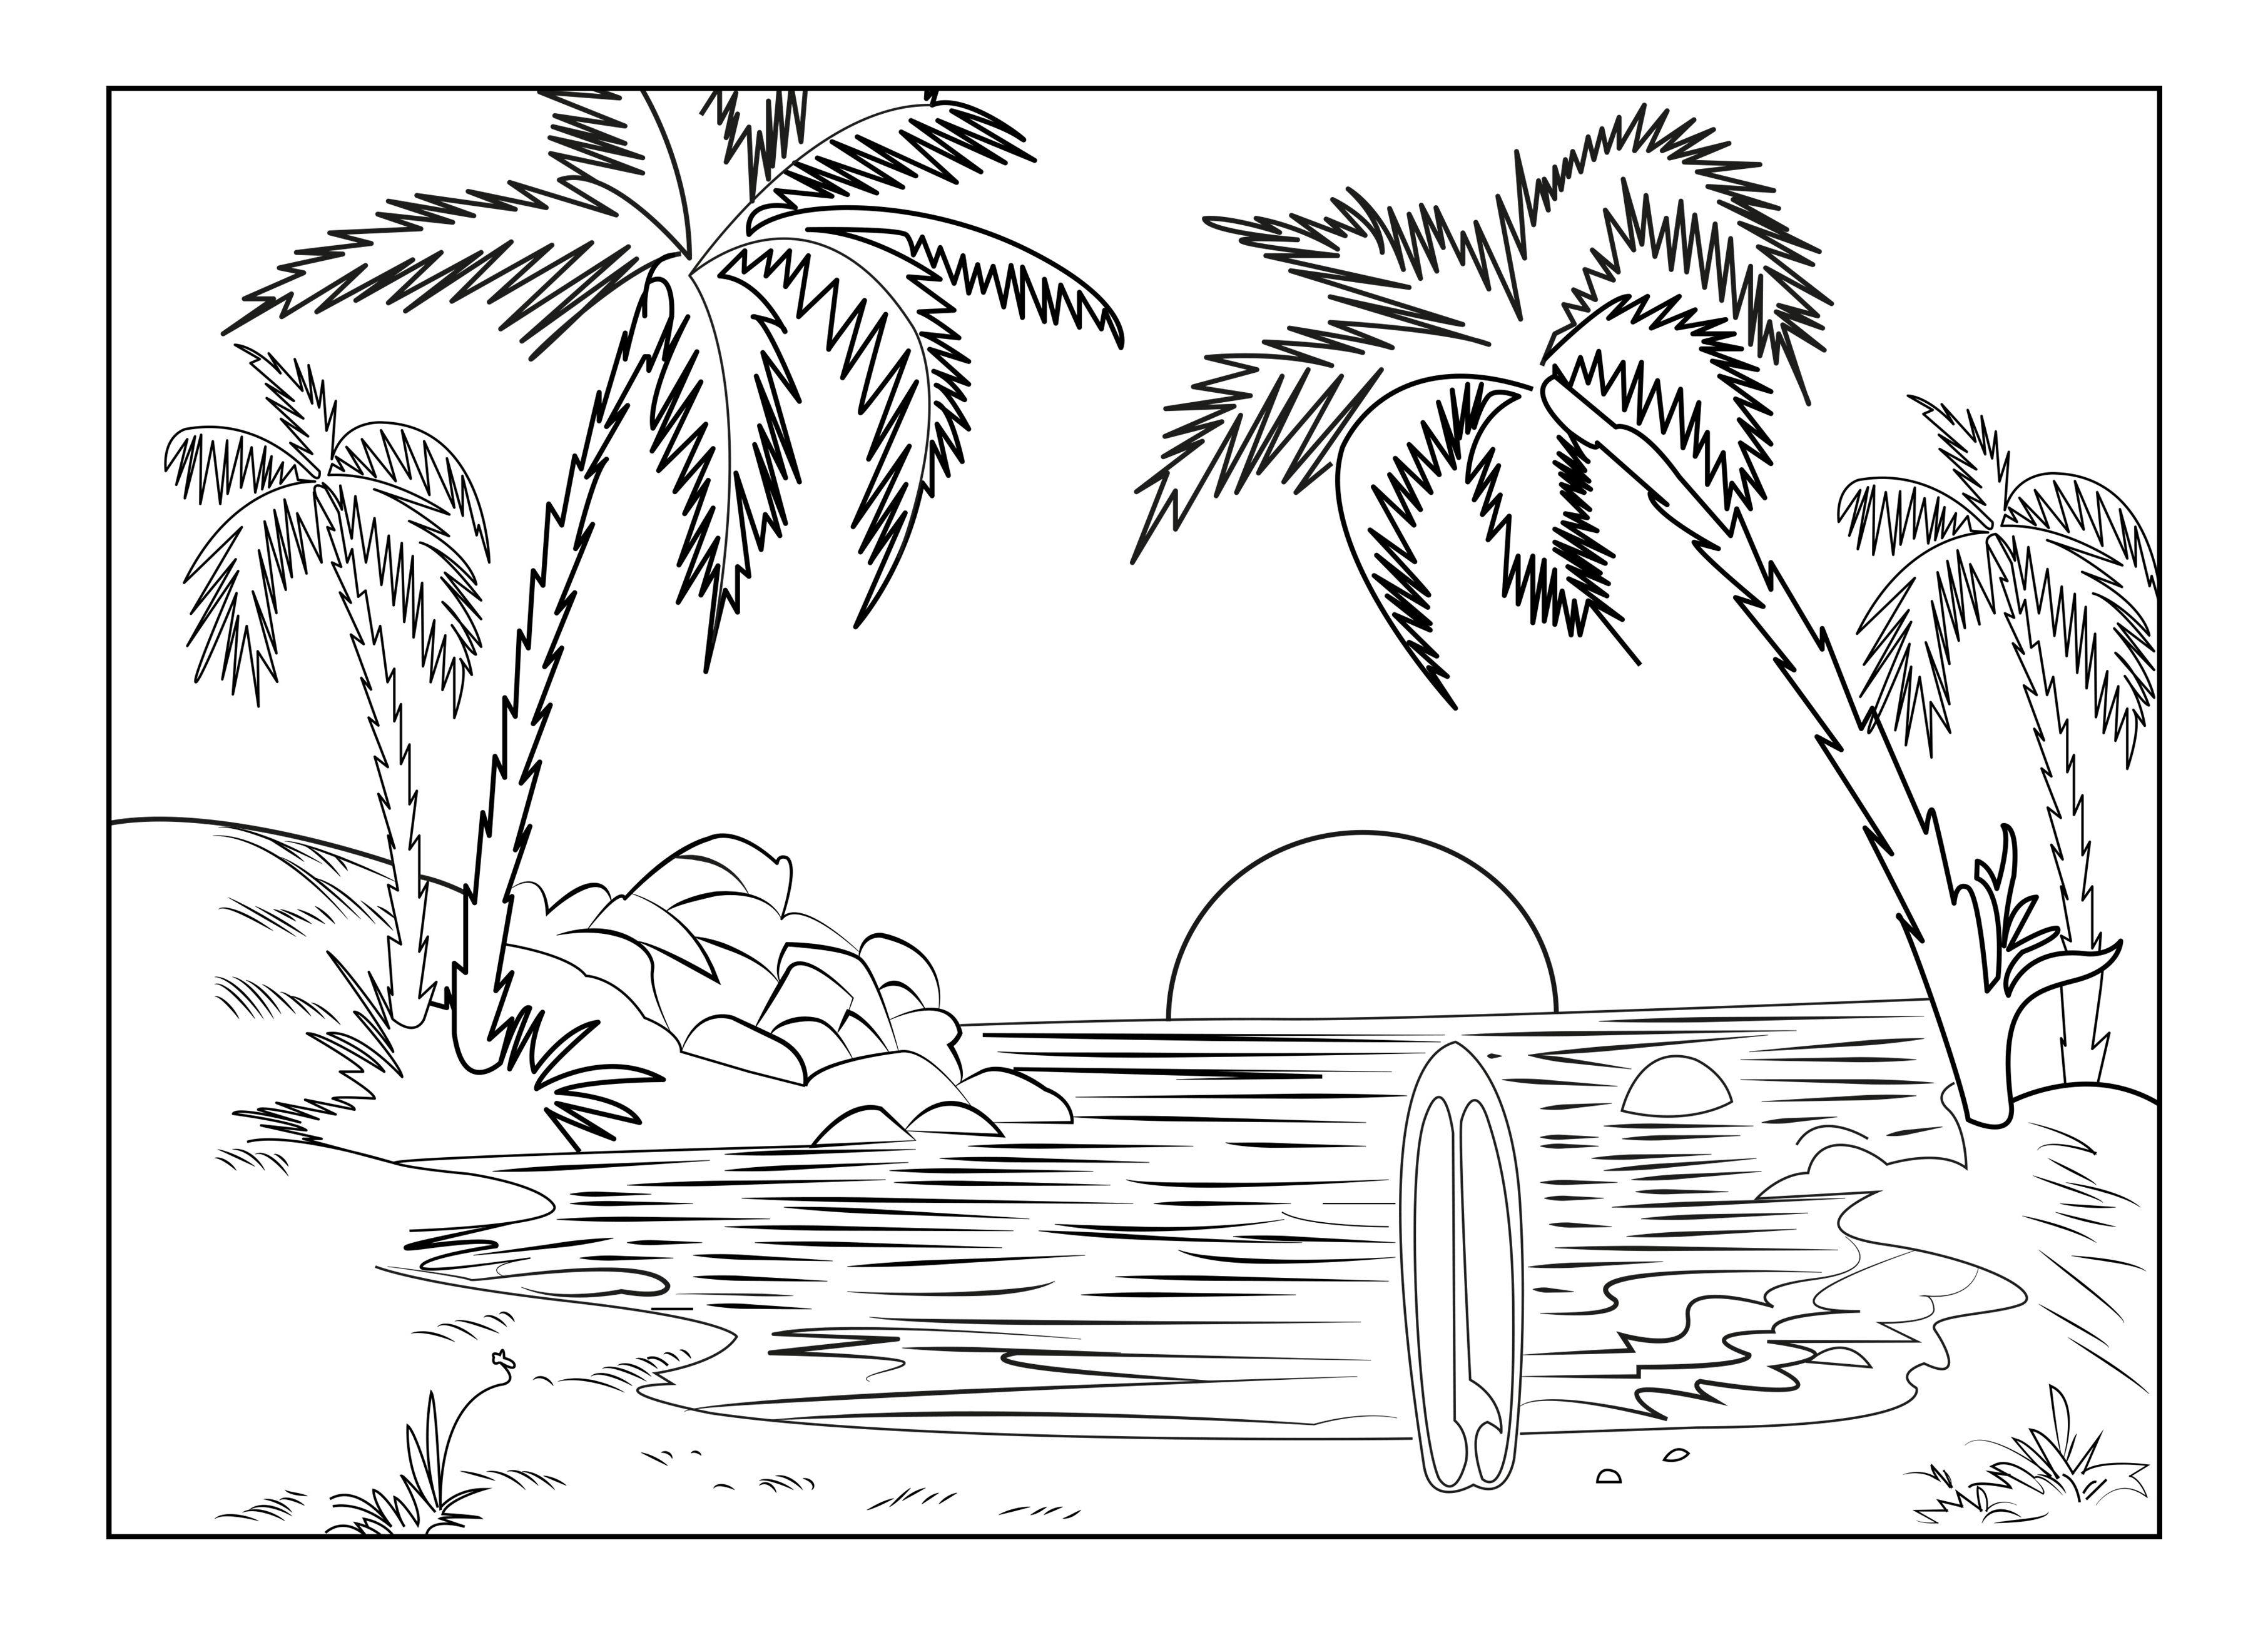 Landscape Coloring Pages Coloring Pages Nature Beach Coloring Pages Summer Coloring Pages